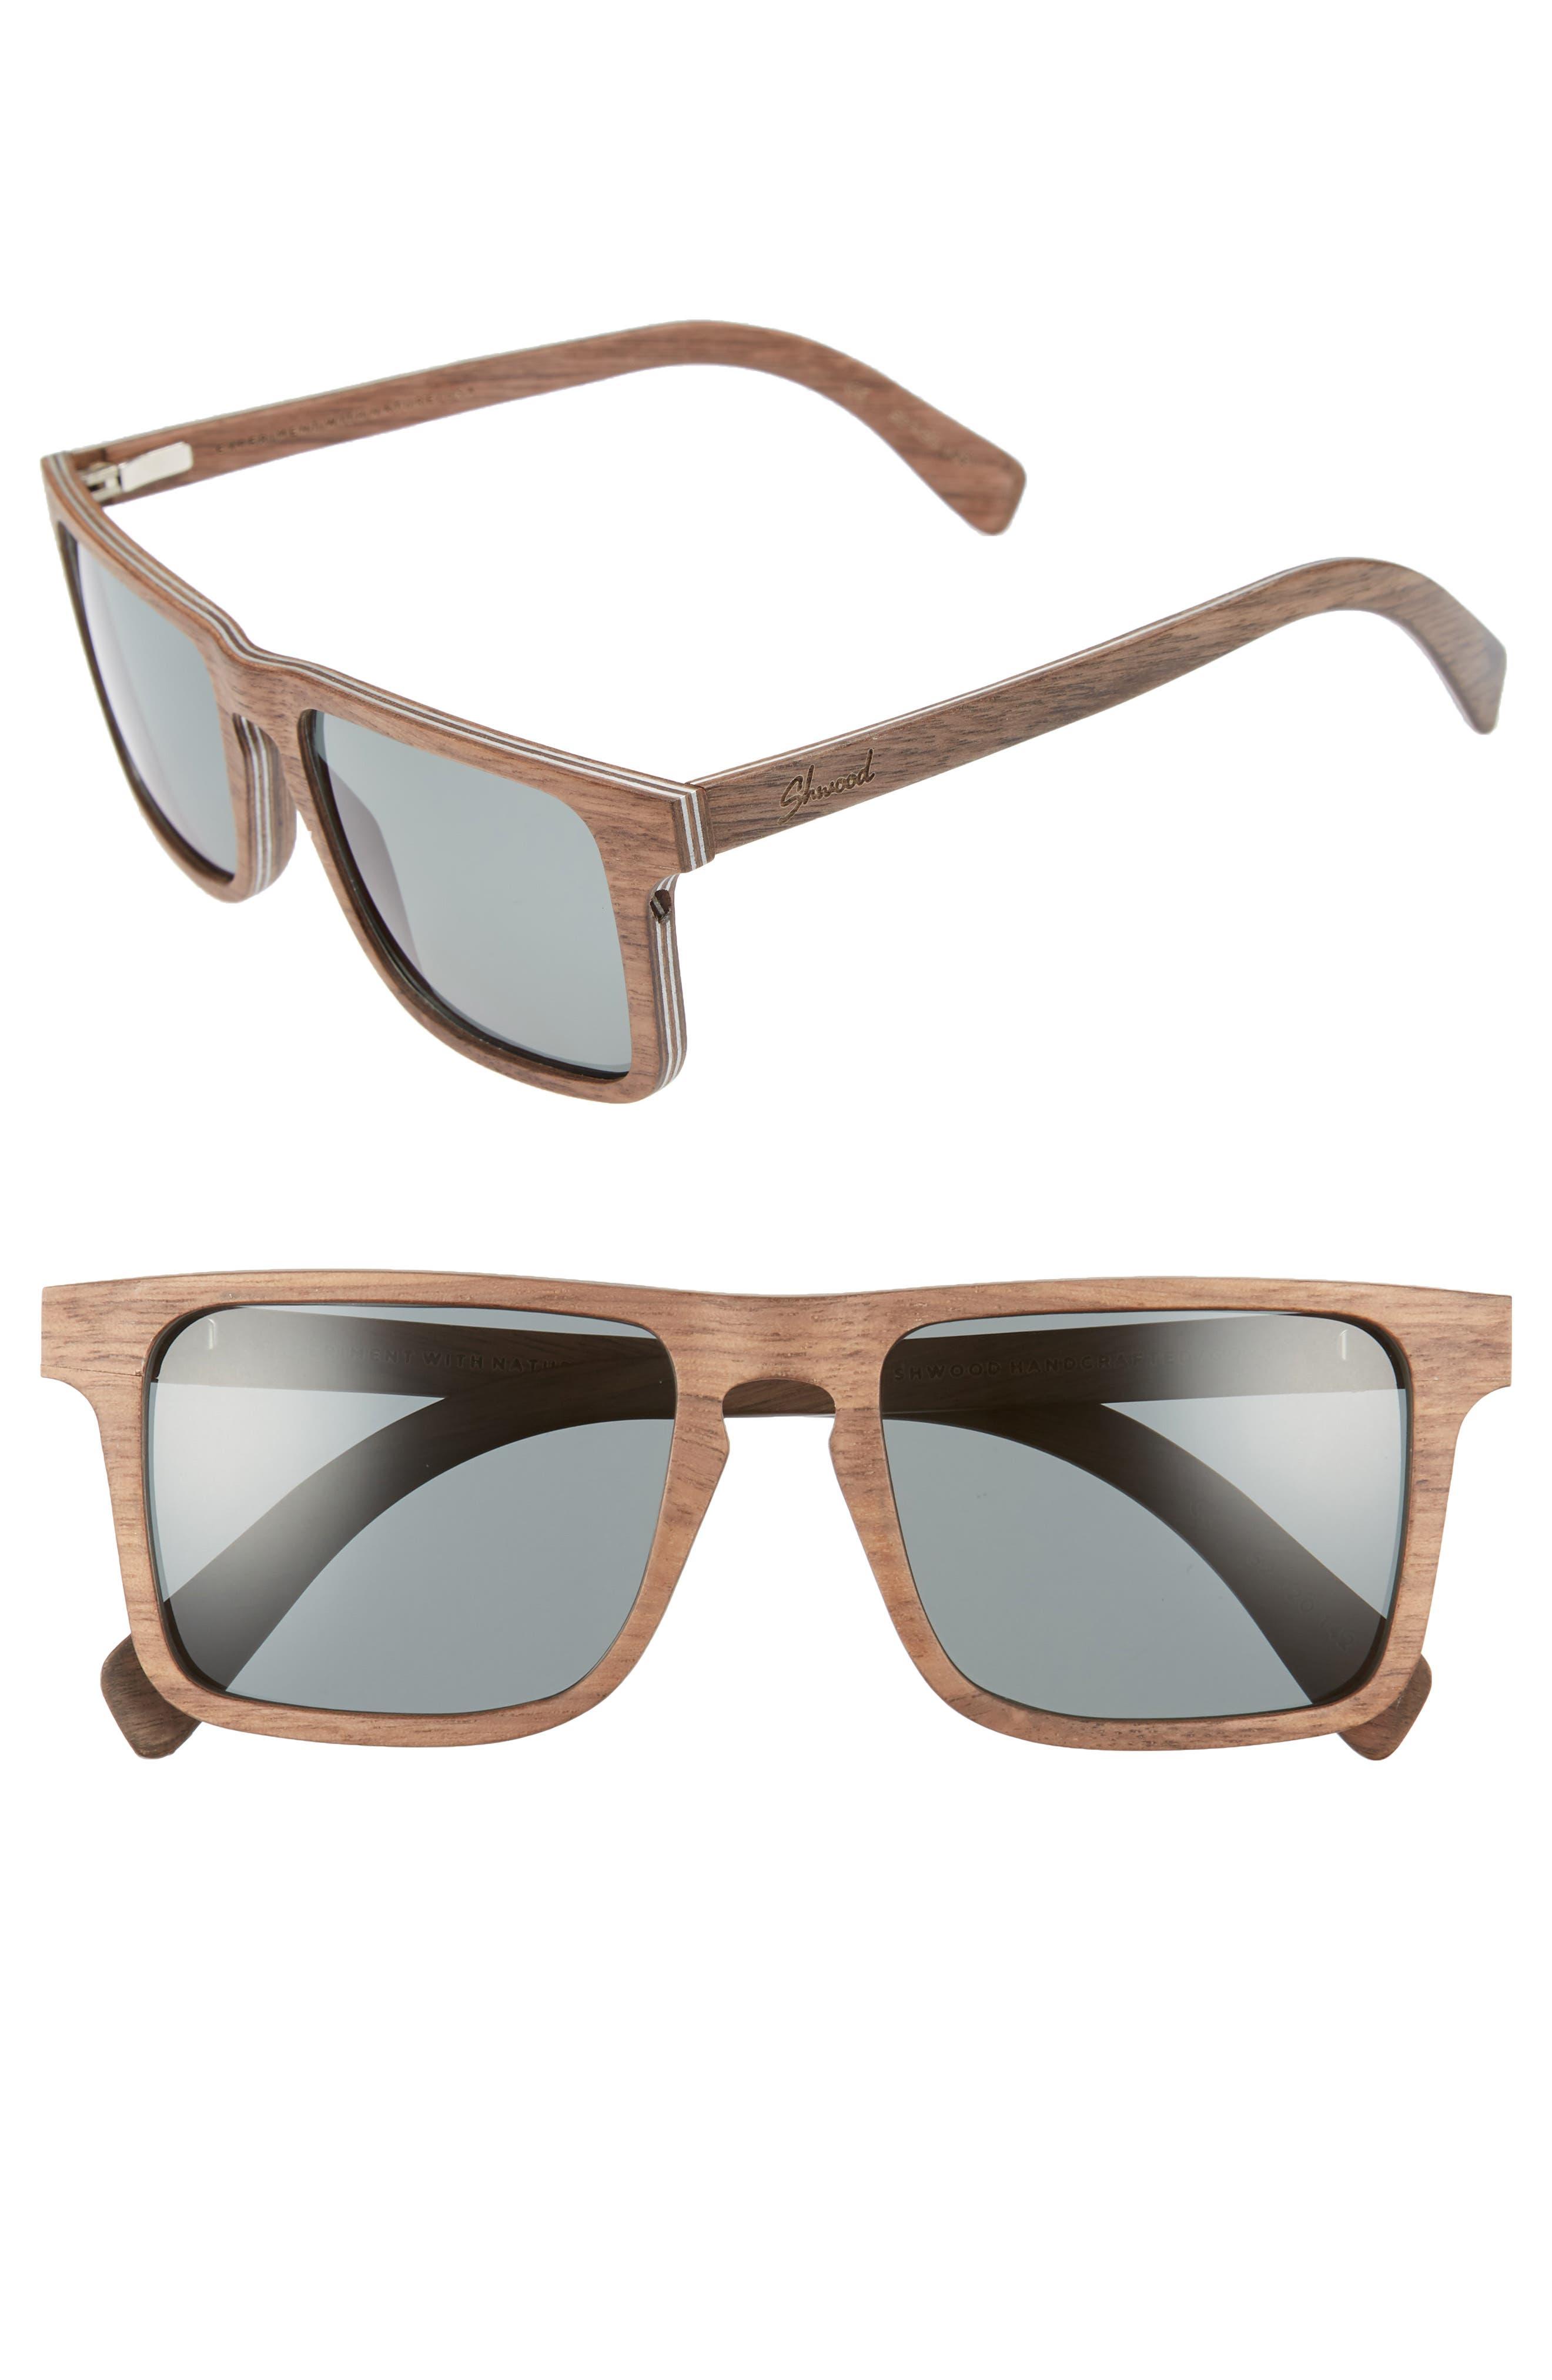 Govy 2 52mm Polarized Wood Sunglasses,                         Main,                         color, Walnut/ Grey